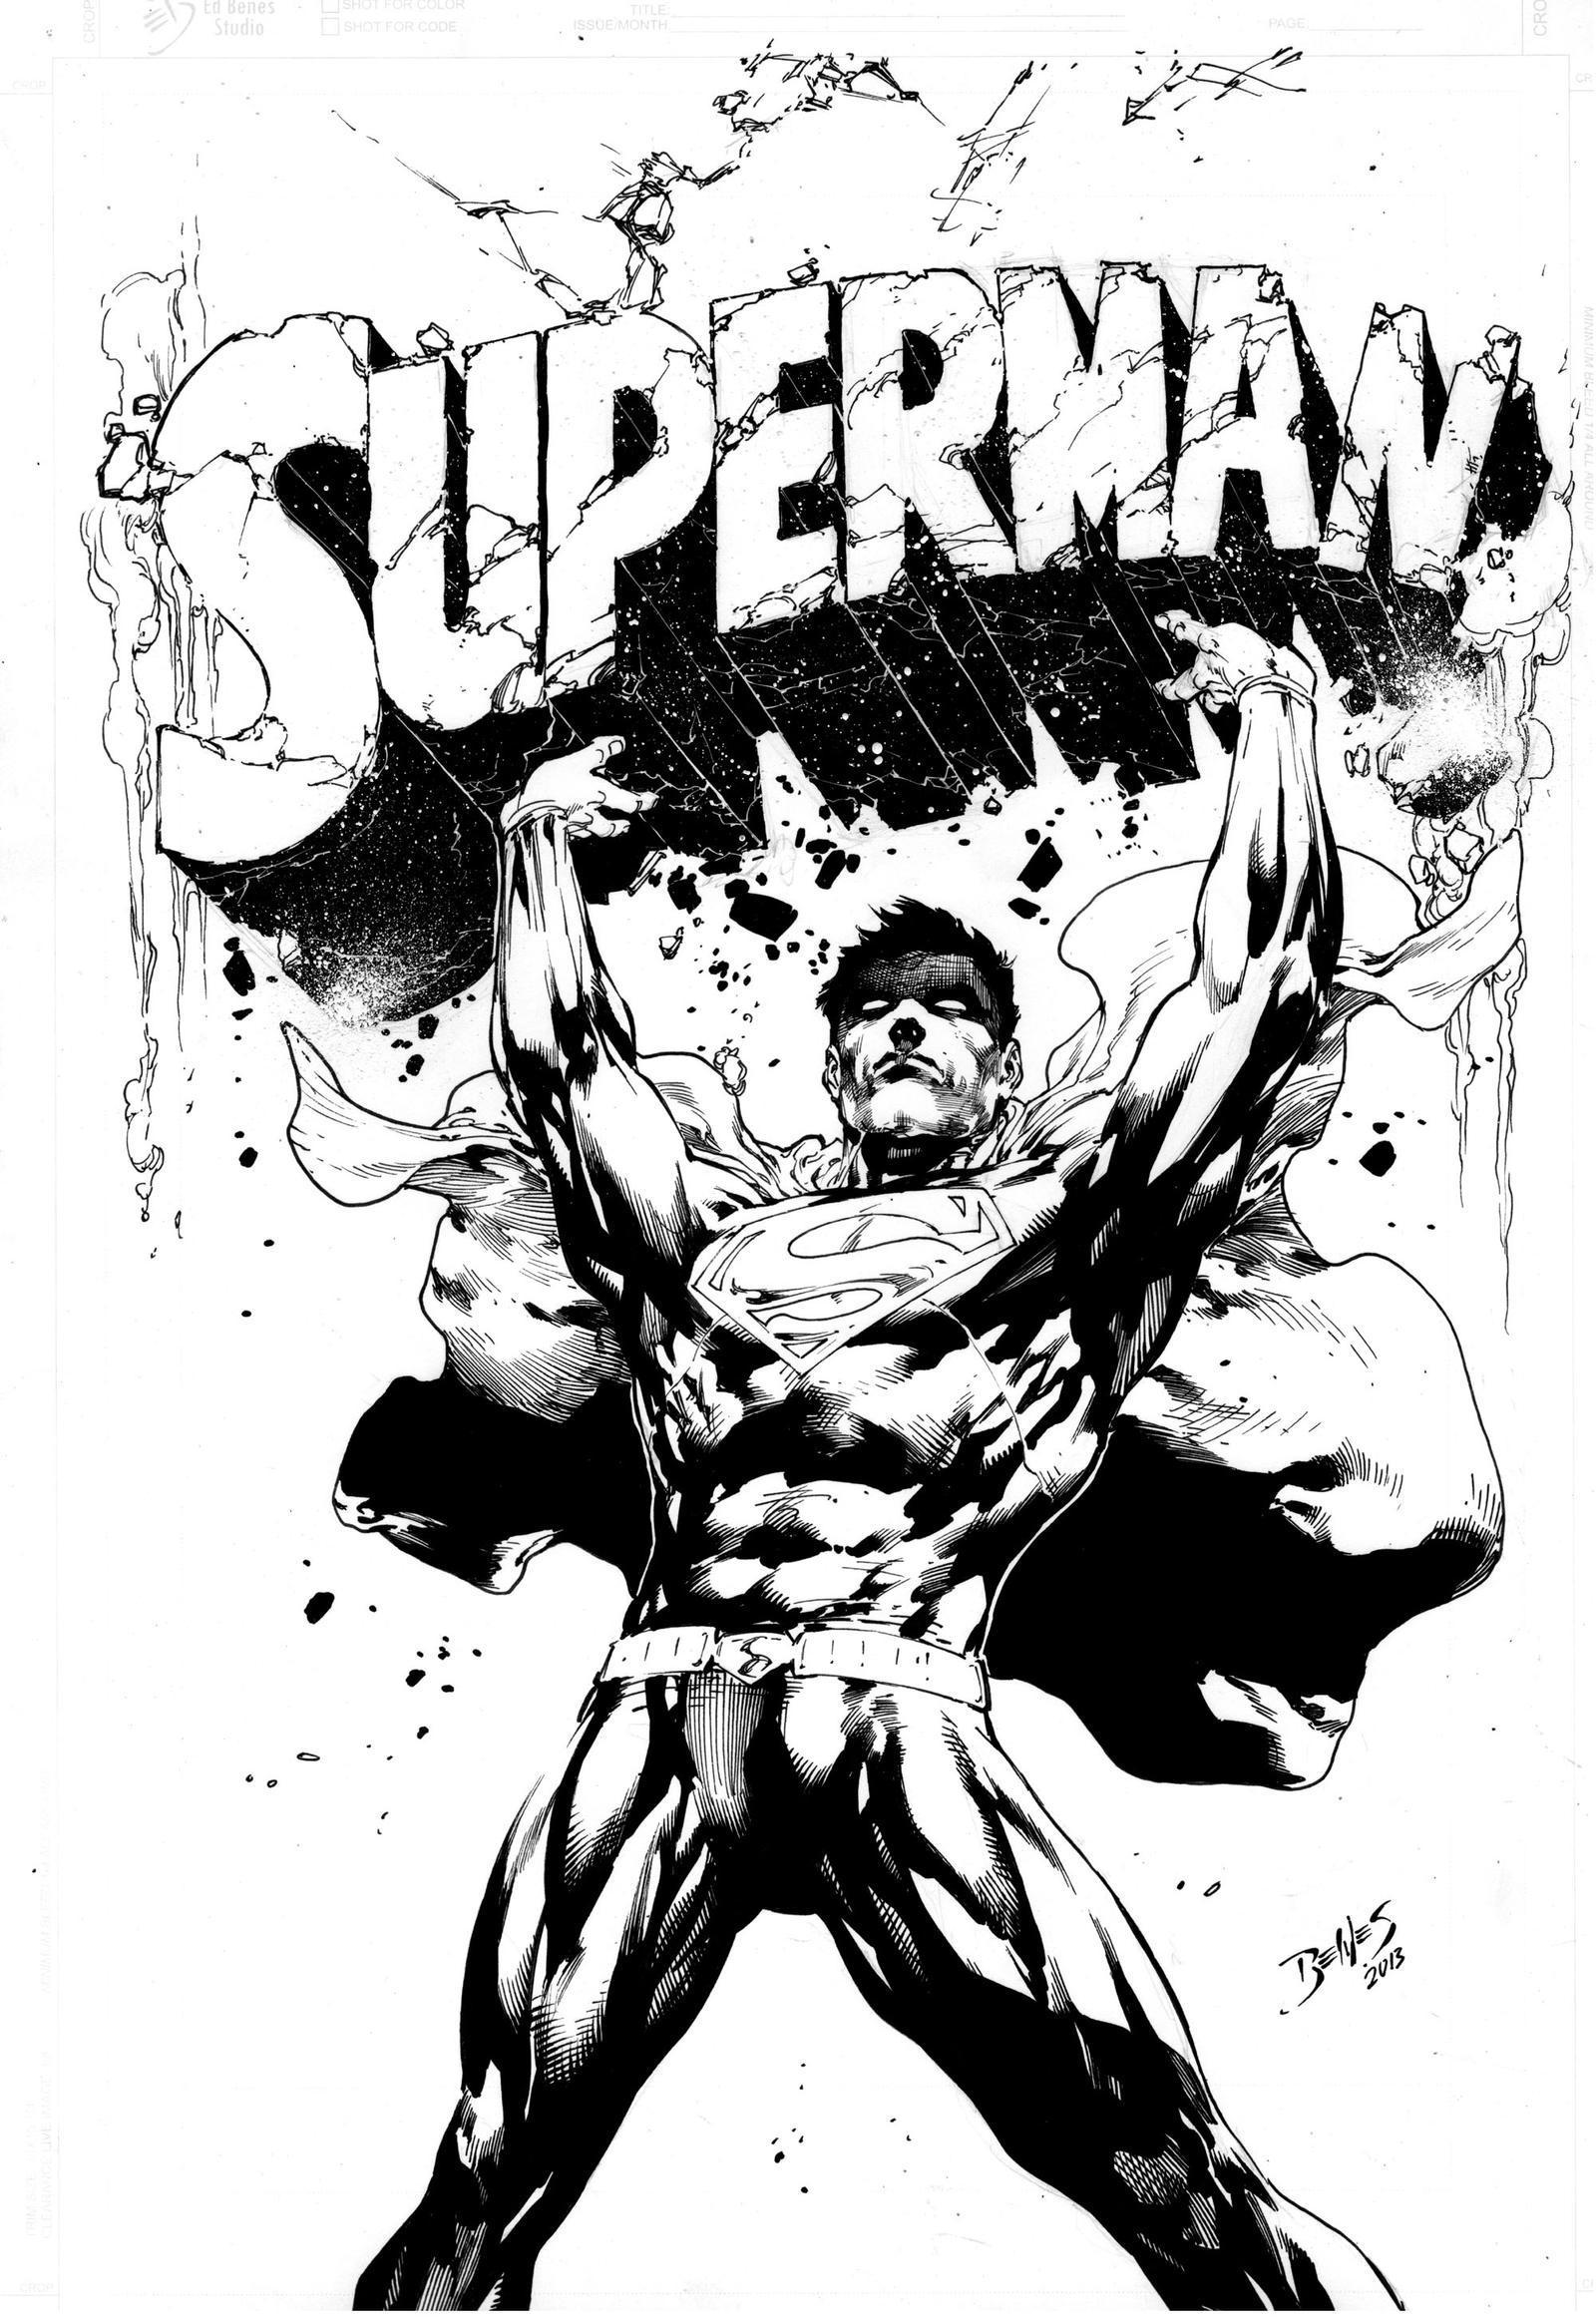 COVER SUPERMAN #28 - I... Easy Superhero Drawing